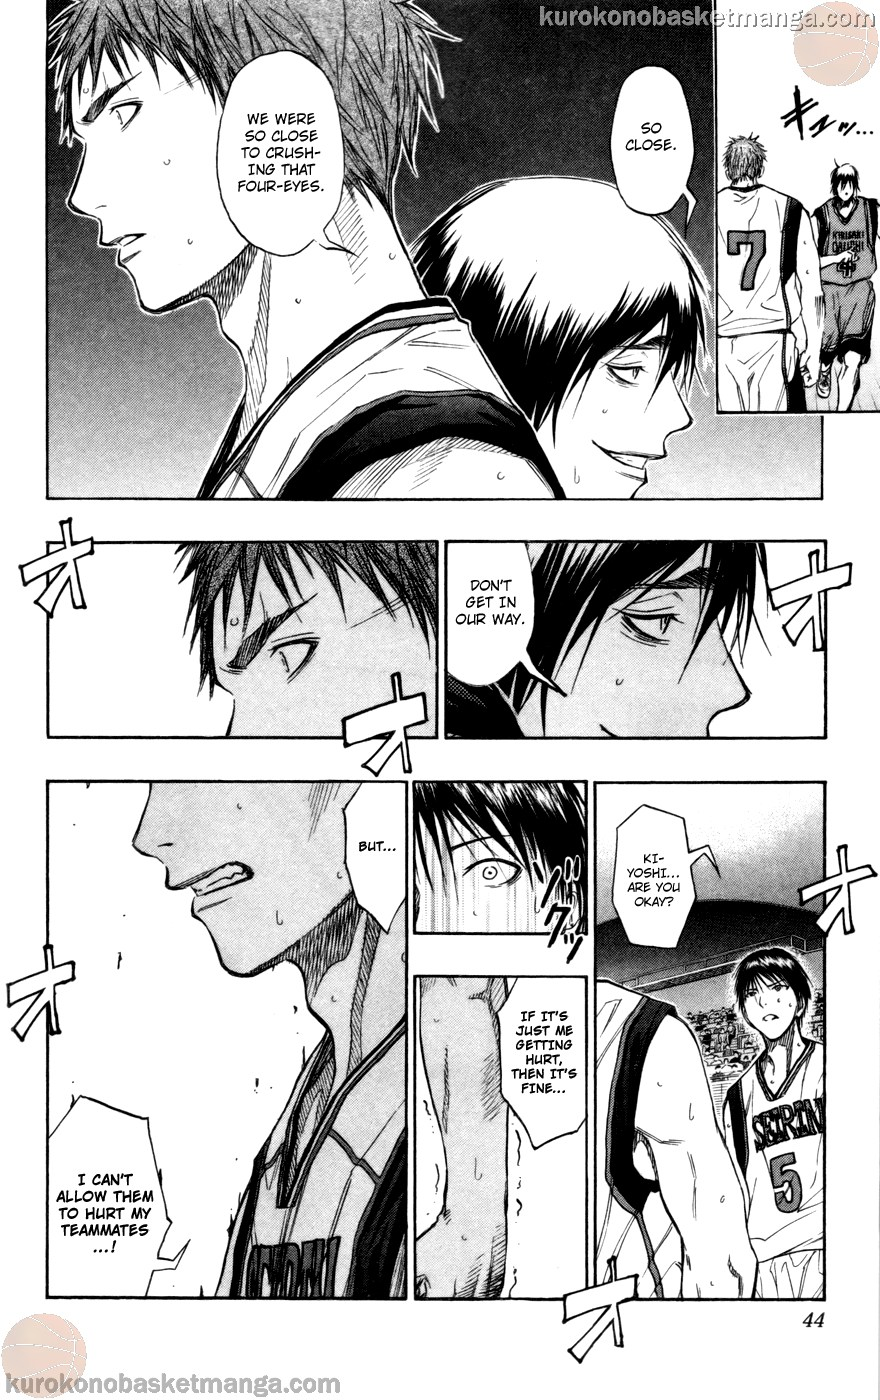 Kuroko no Basket Manga Chapter 101 - Image 17